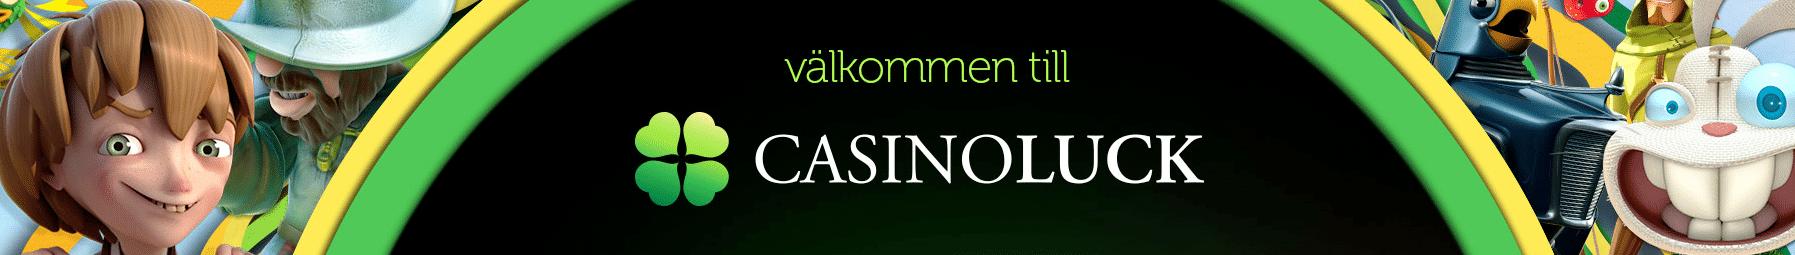 CasinoLuck Header